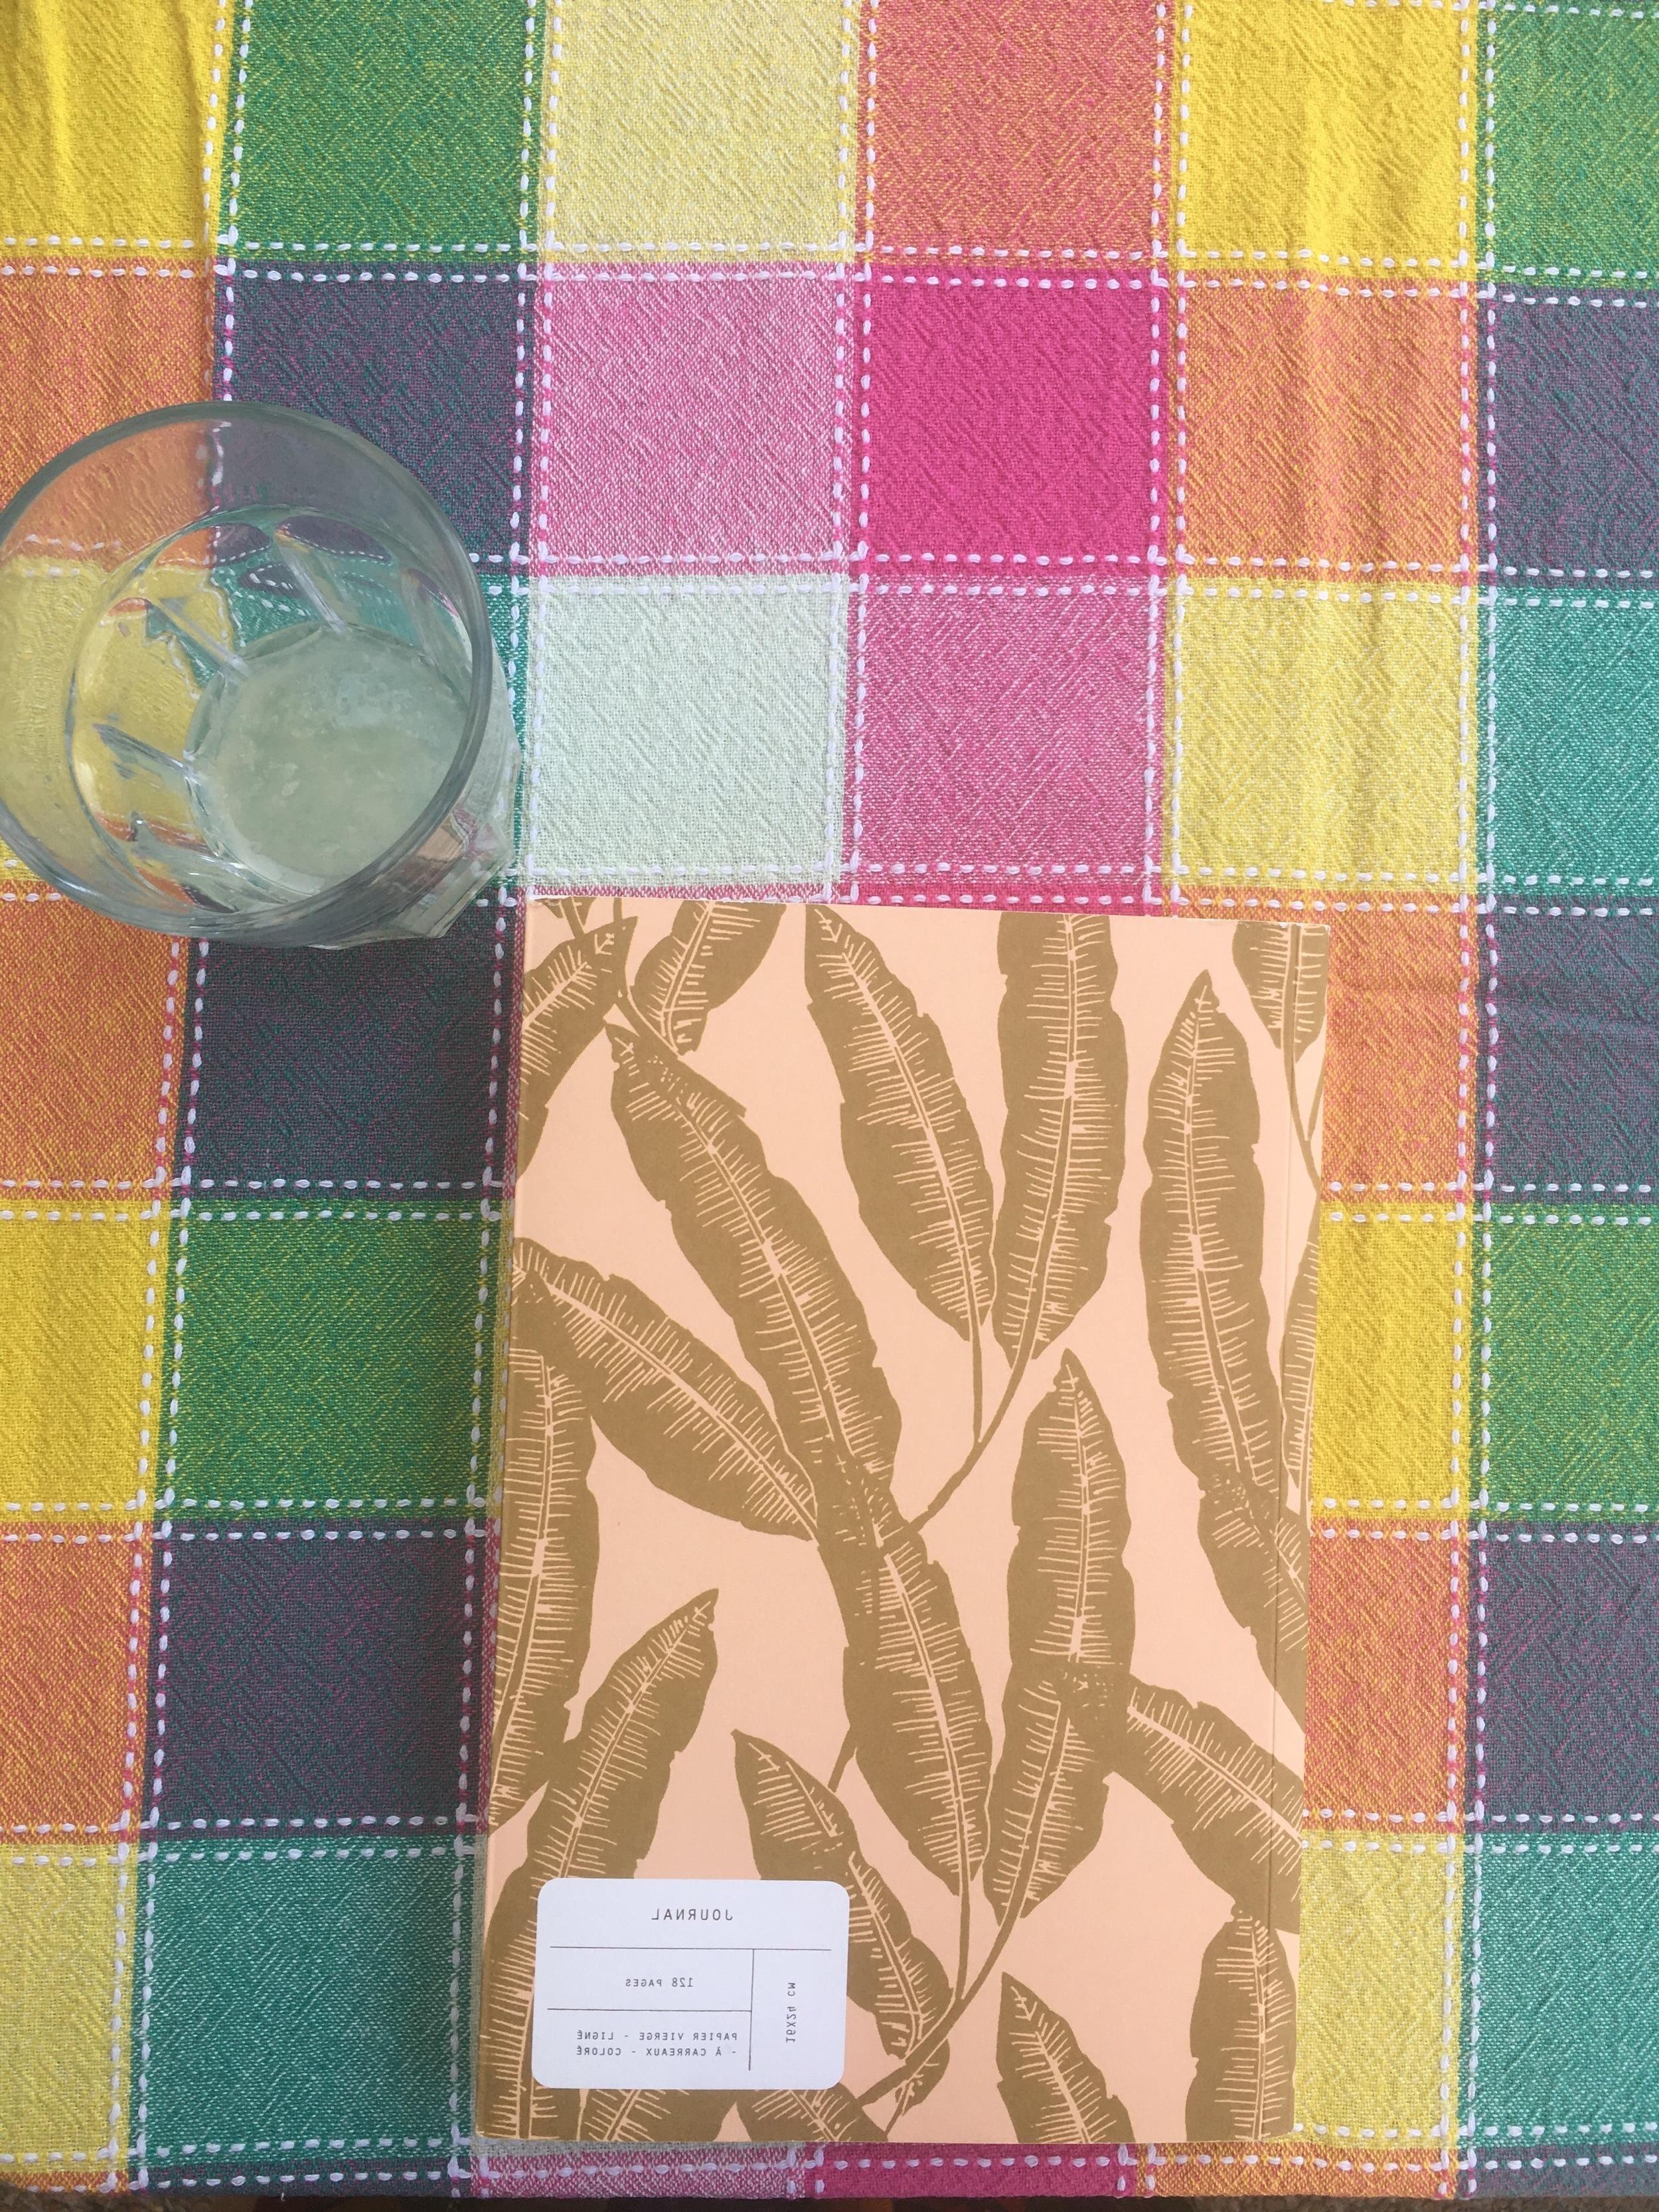 Carnet de Bords de Recup2Fibres, Atypique Atipico, Lili Jullian